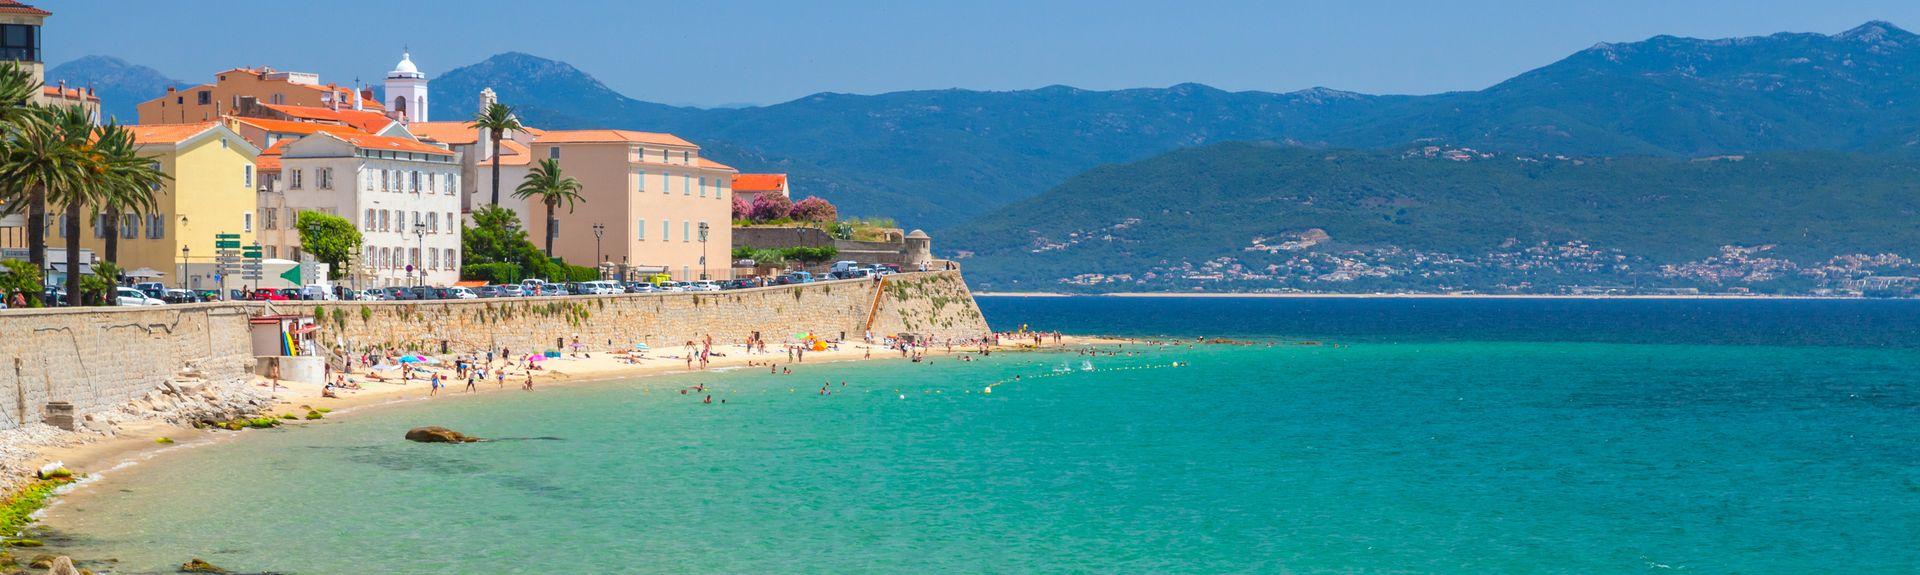 Ajaccio, Korsika, Frankrike